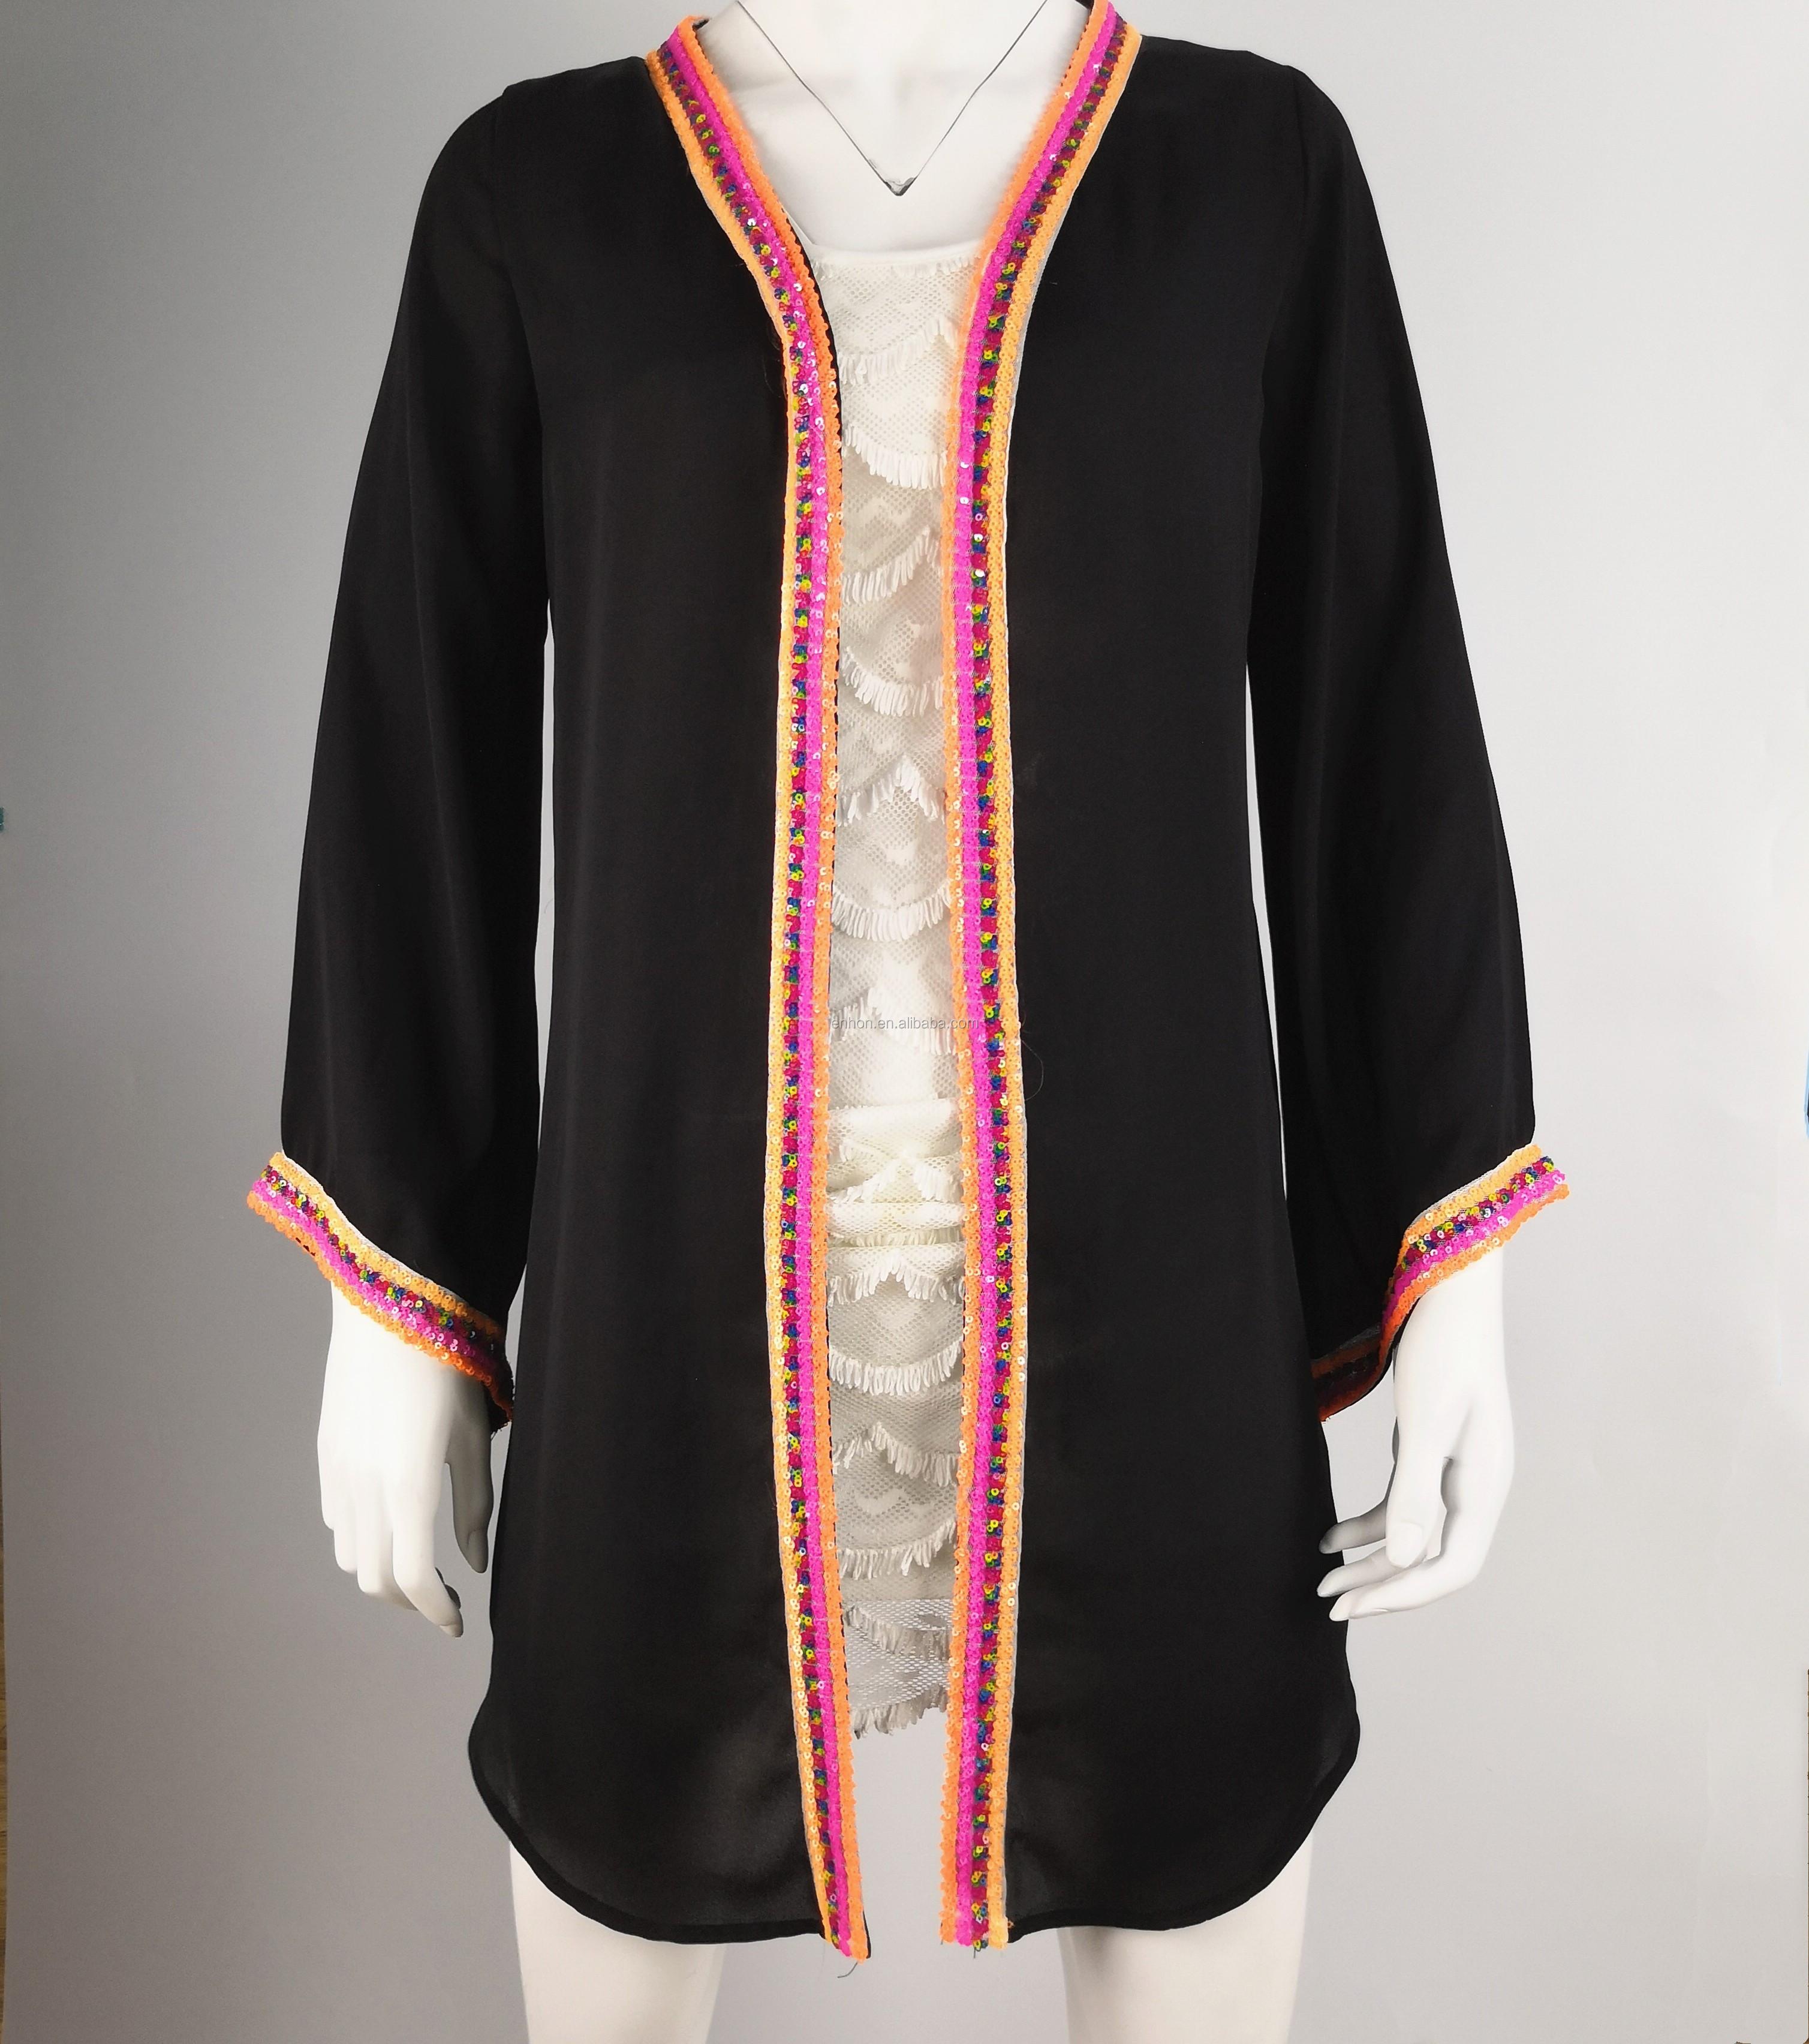 8e896bd144 China Fashion Ethnic Clothing OEM long dress chiffon new style Black kaftan  dress Open front long dresses for women